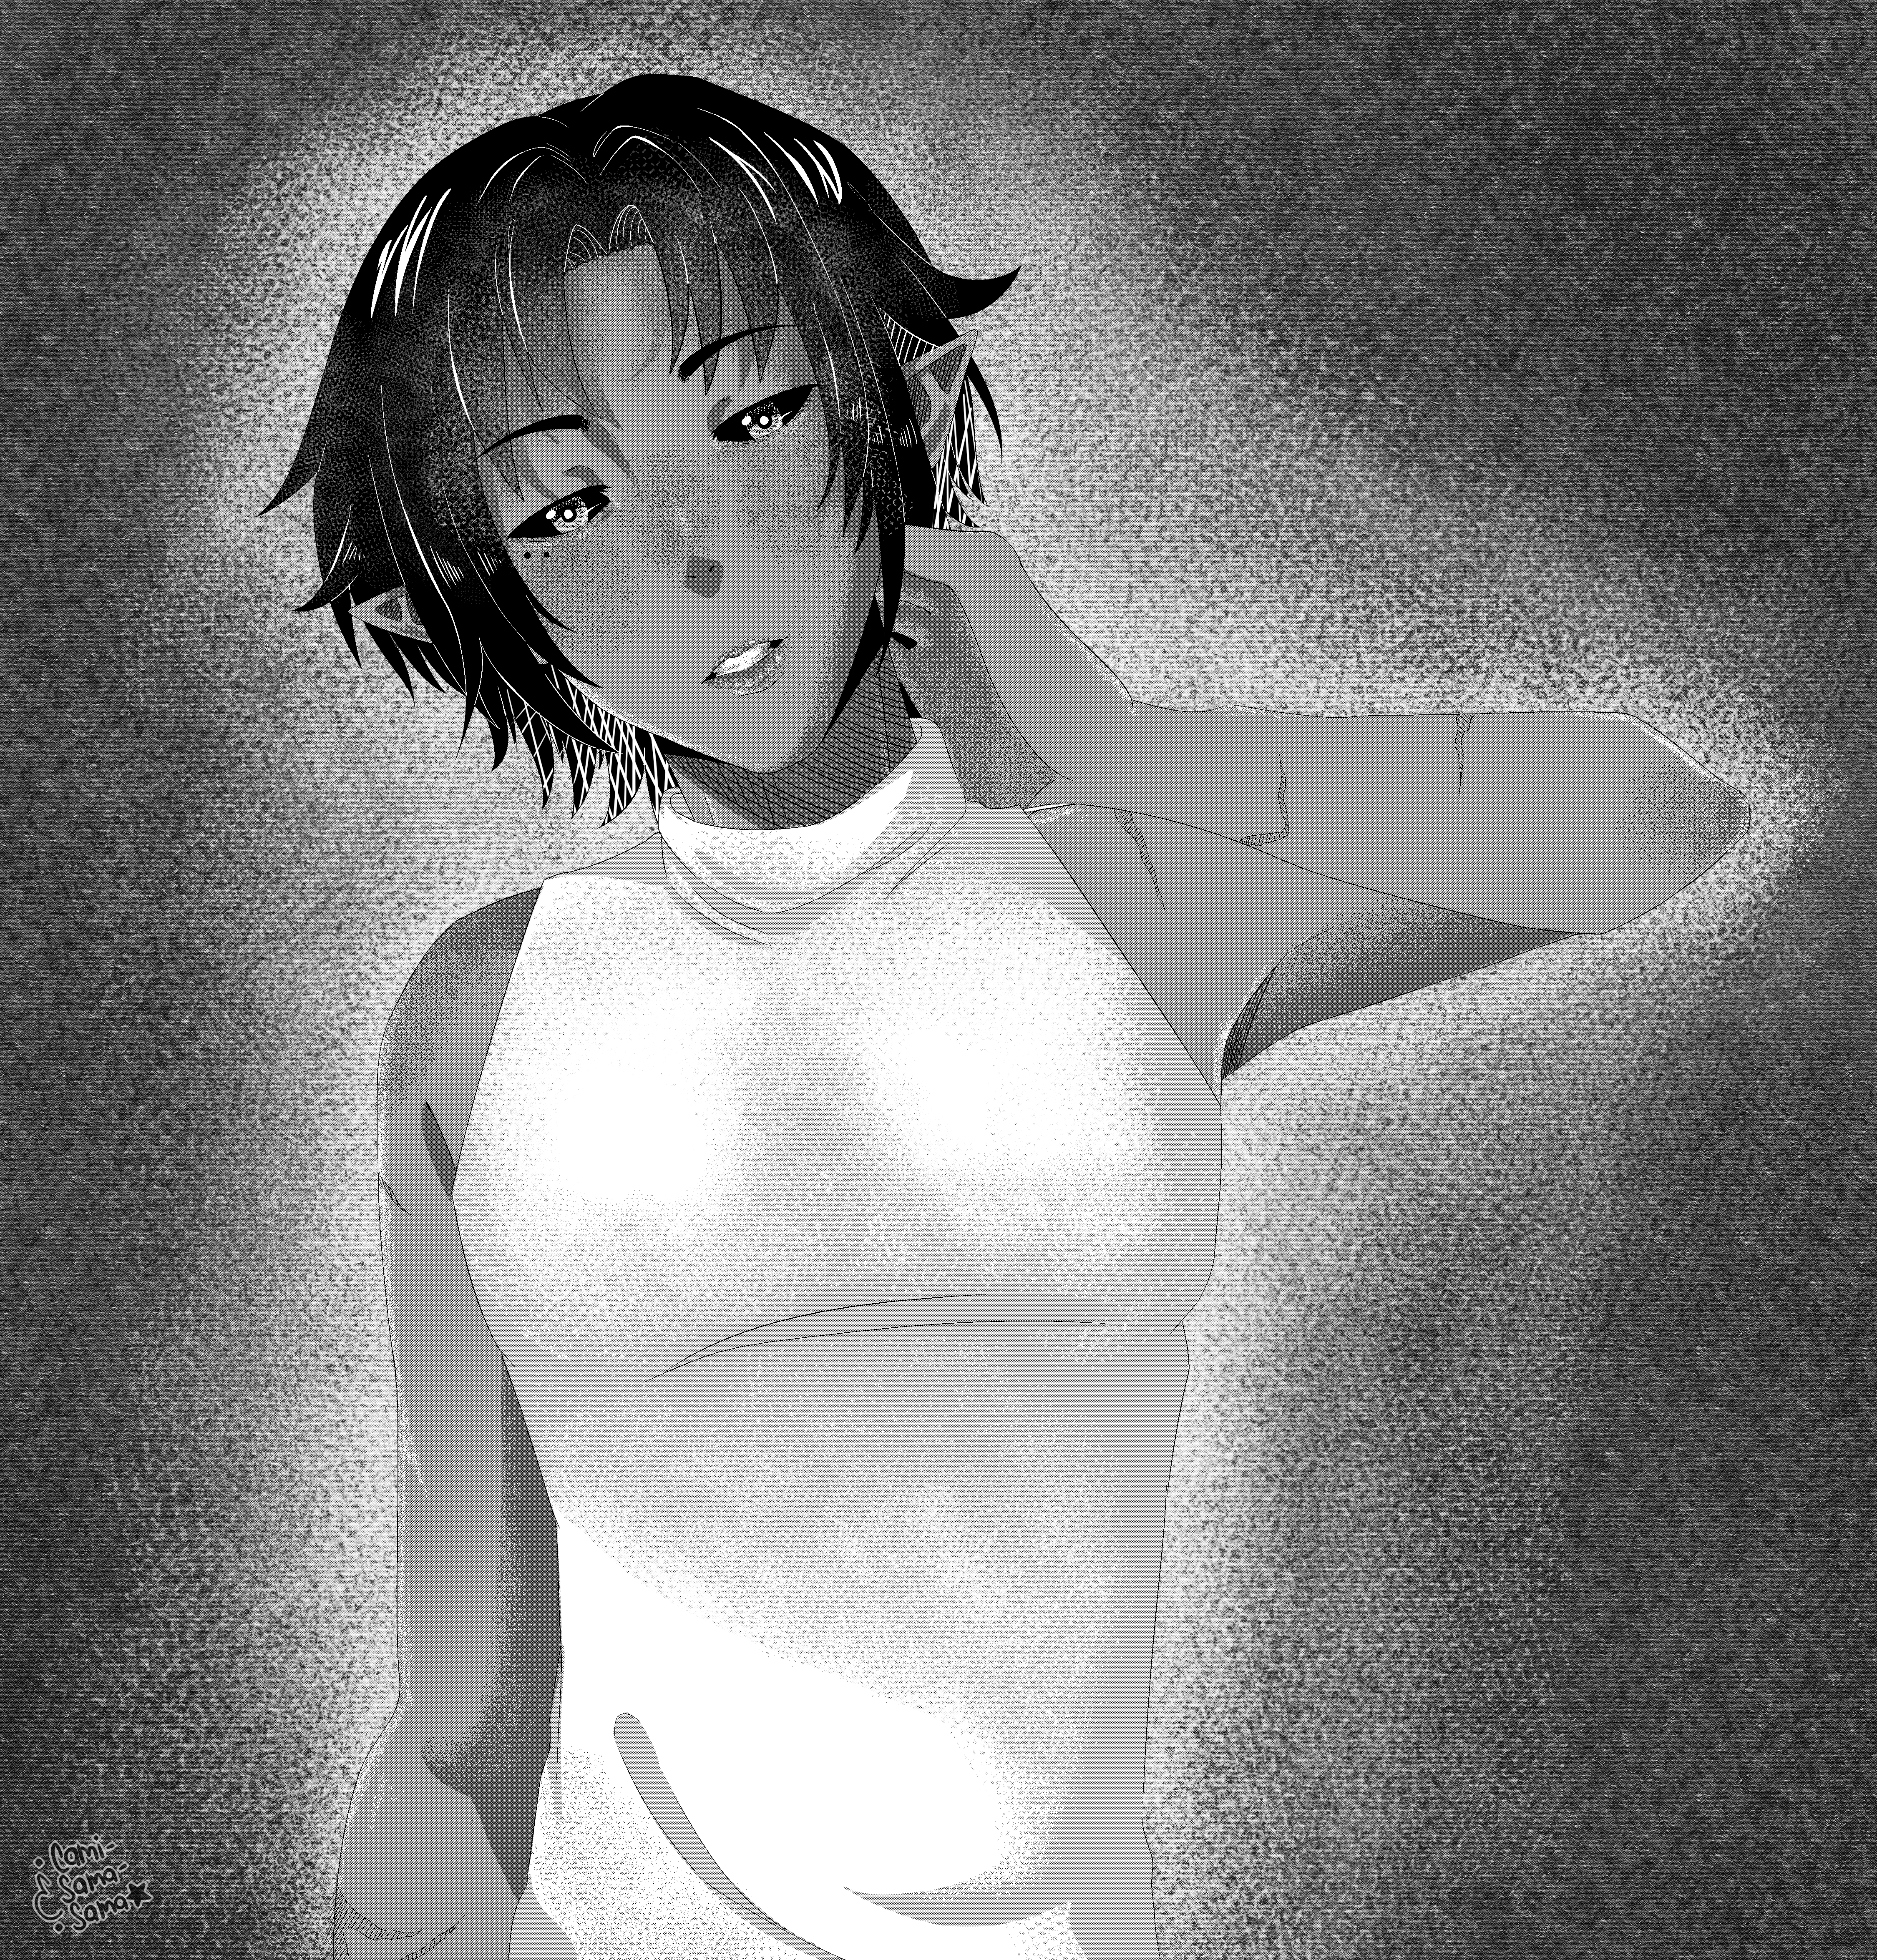 .: Art trade :. Rajh manga drawing. by Cami-Sama-Sama